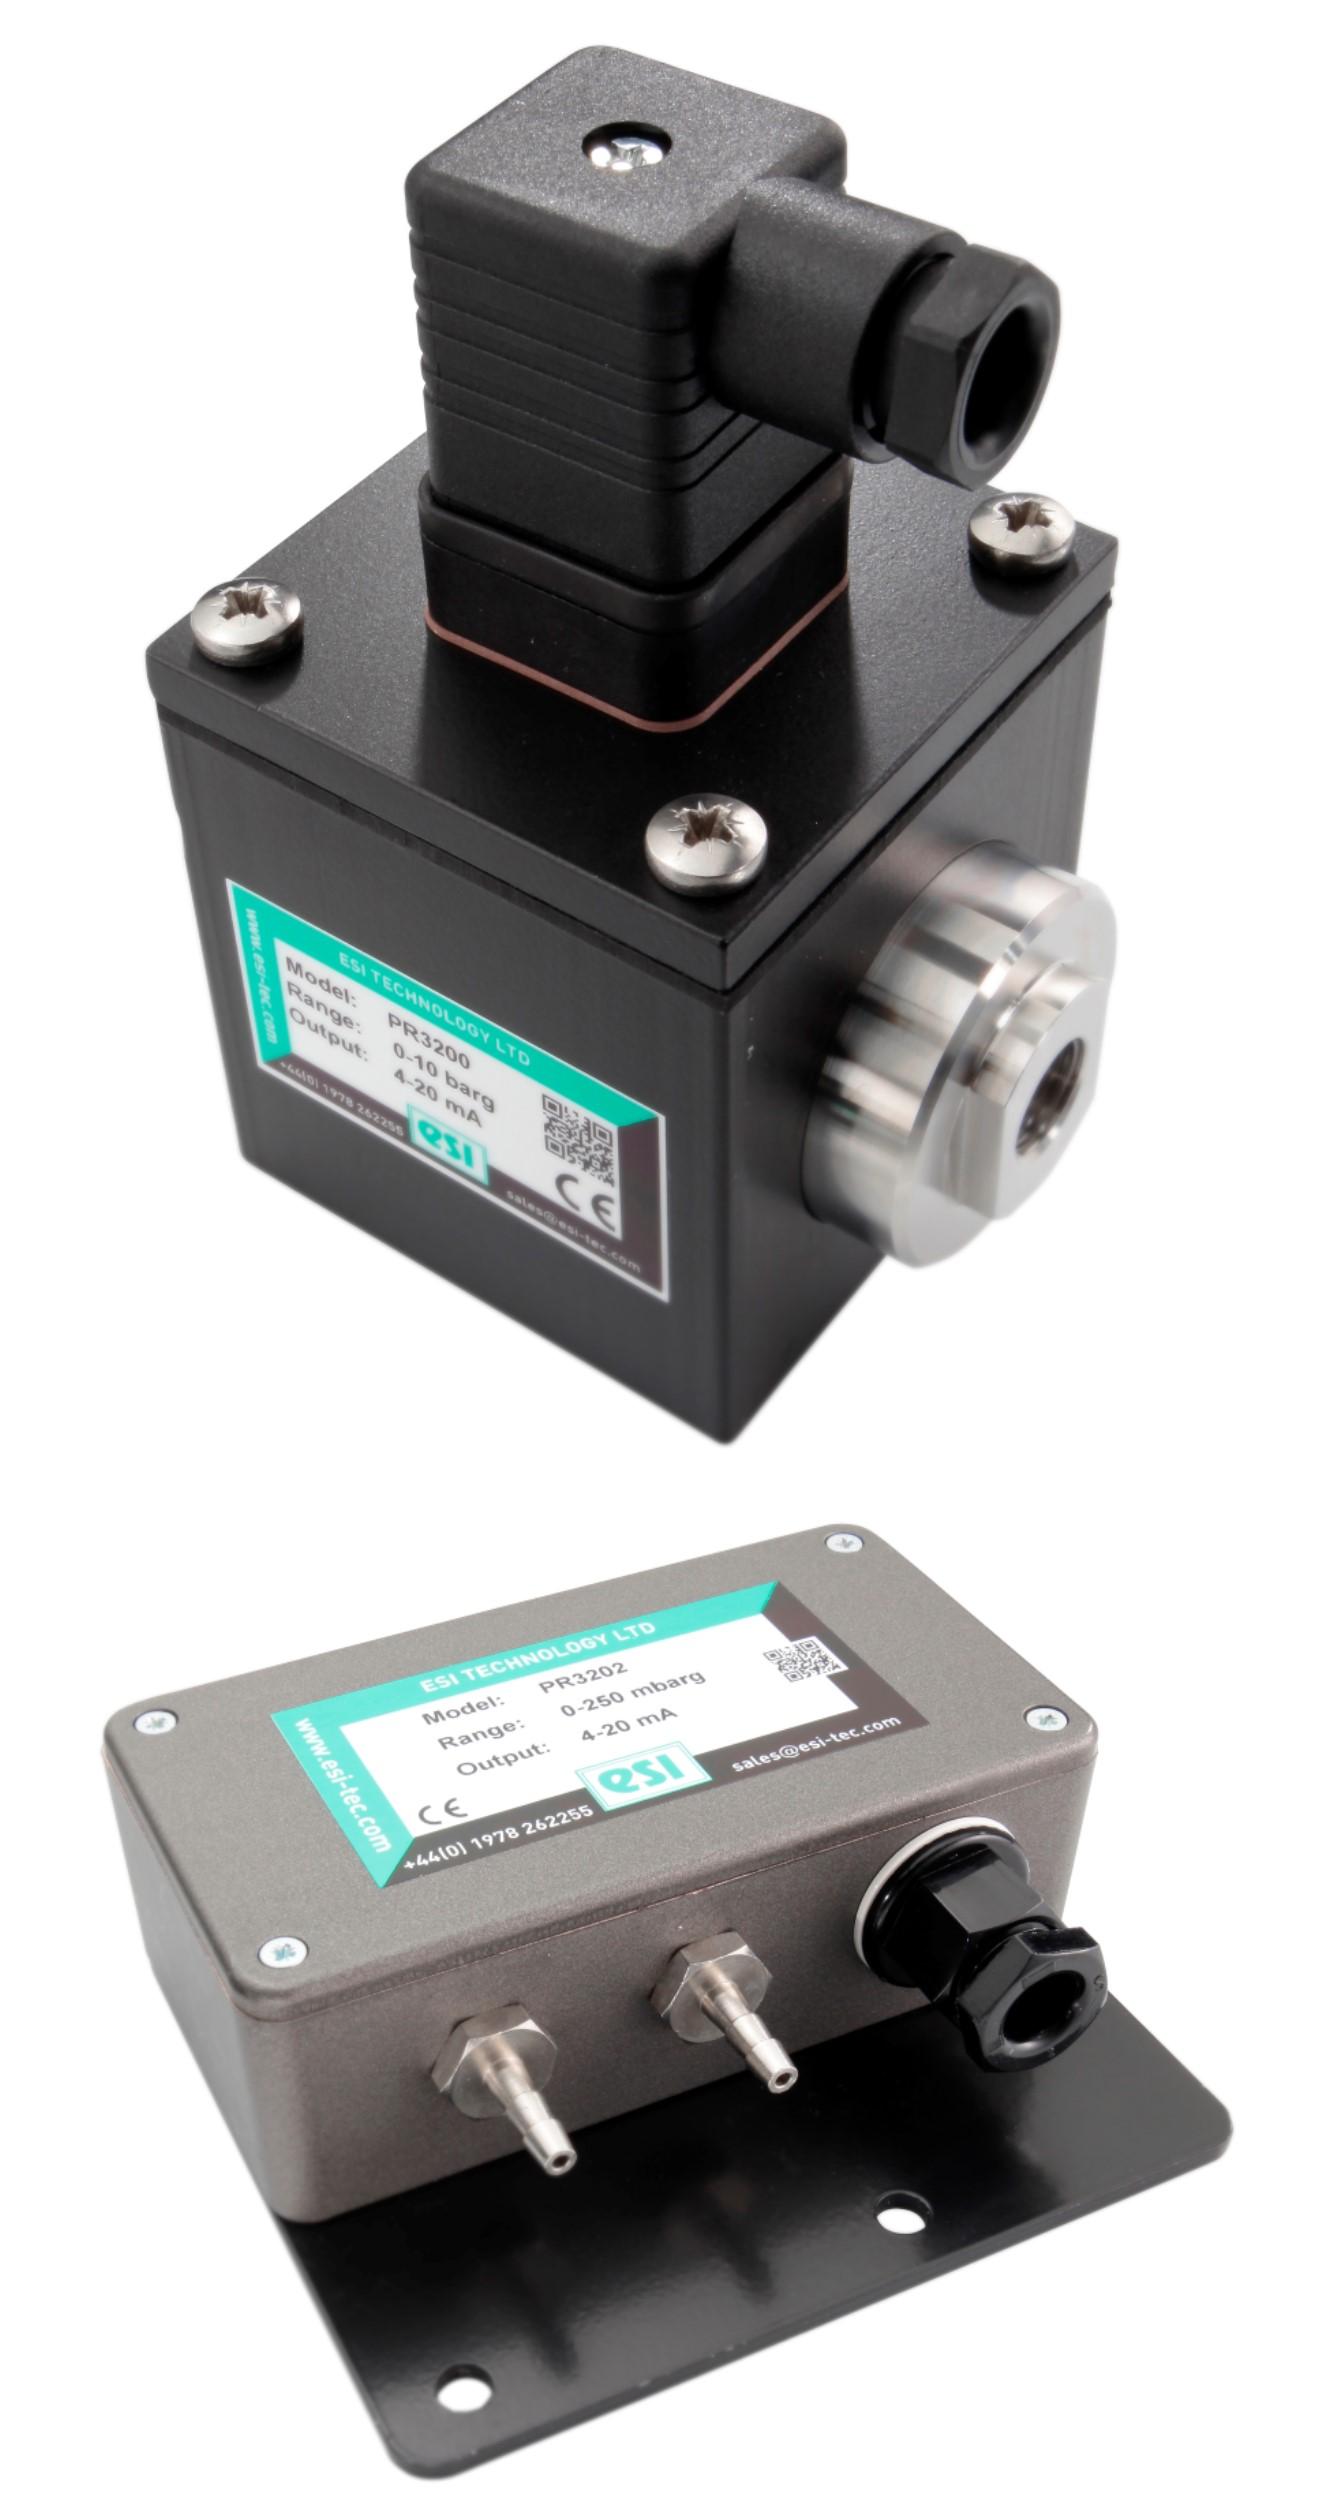 SUCO VSE FRANCE - Transmetteurs de pression différentielle PROTRAN PR3200/PR3202, de ESI